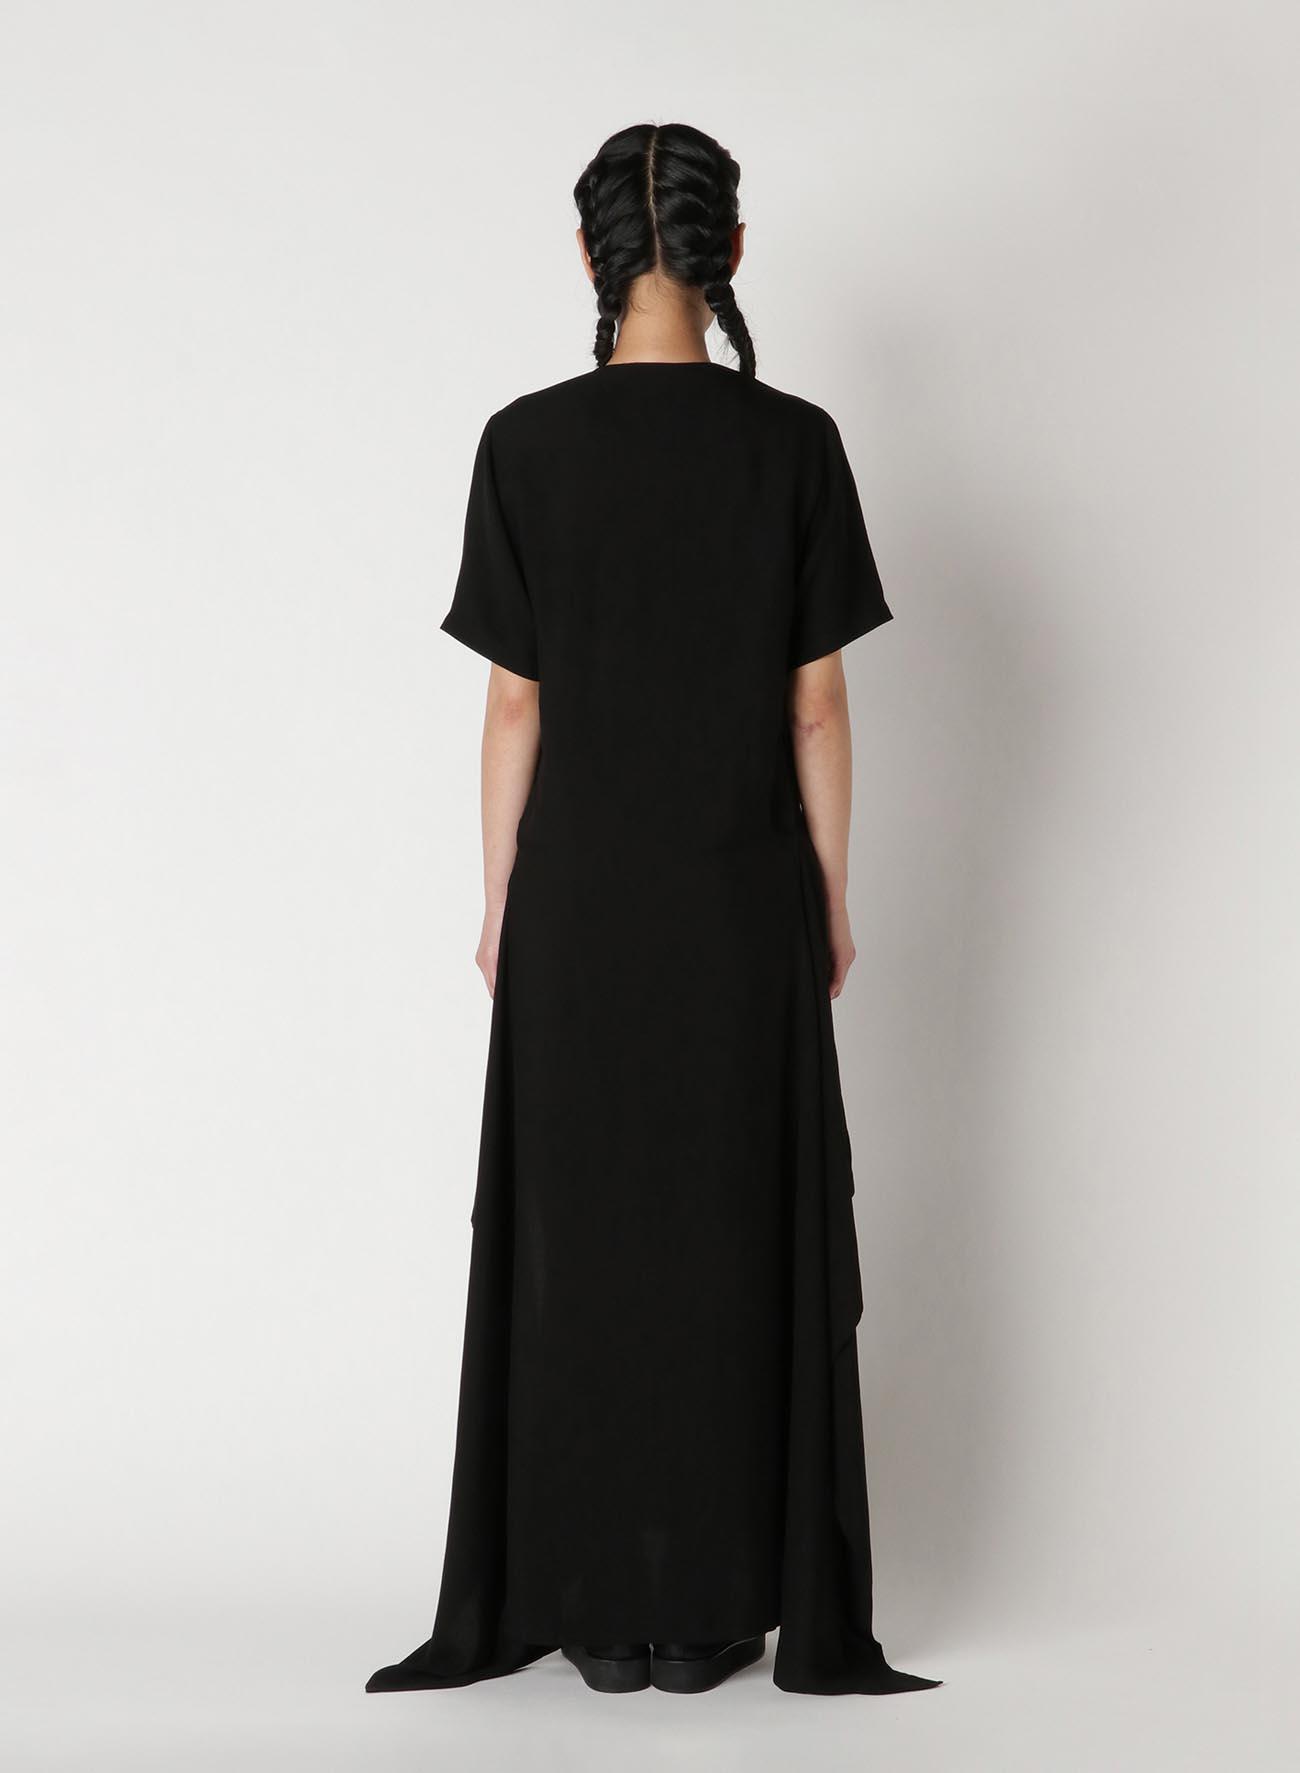 Ten/Cu Tussah Tailored Dress A